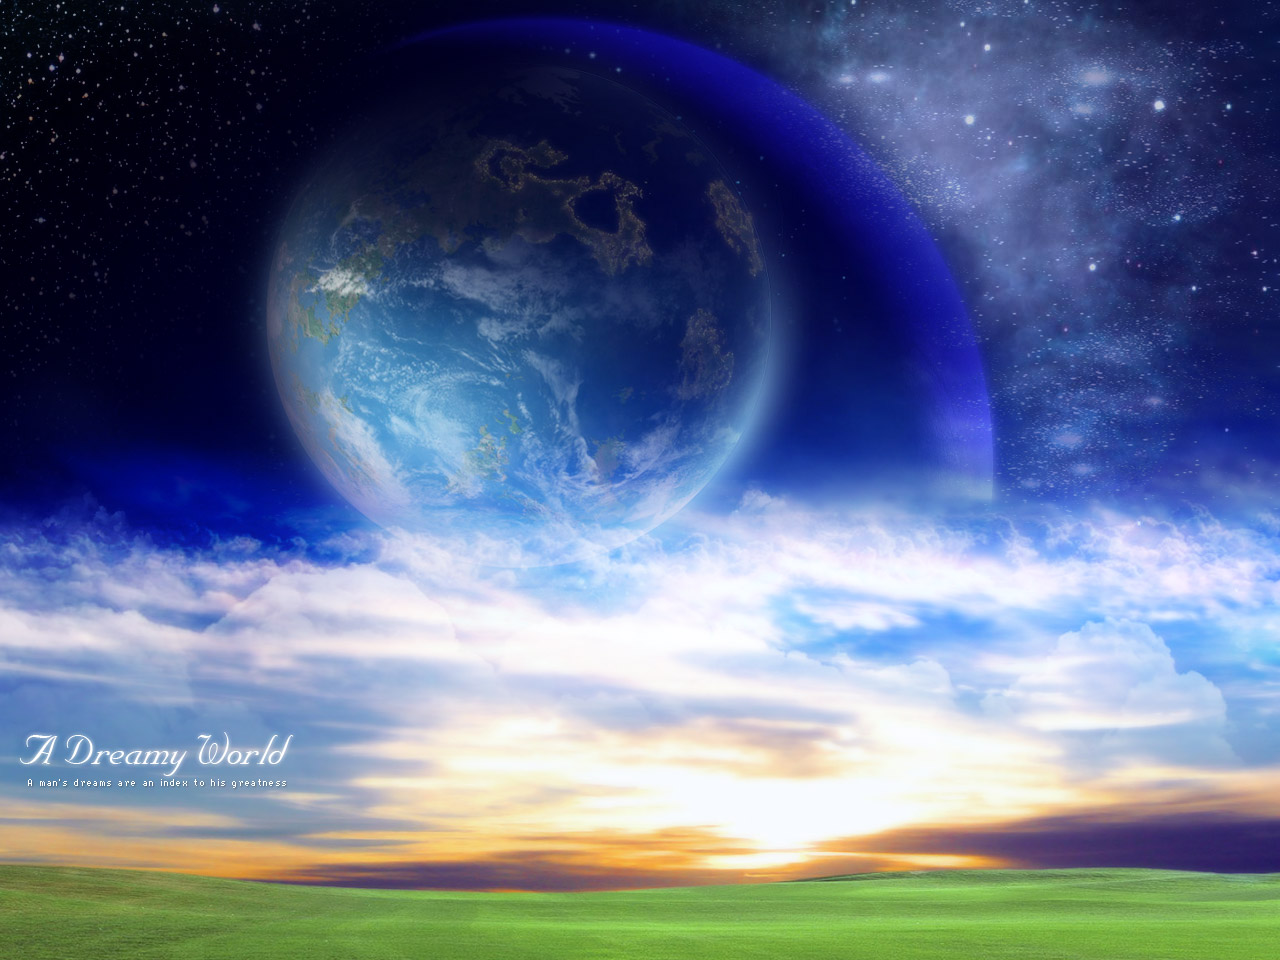 Dream World